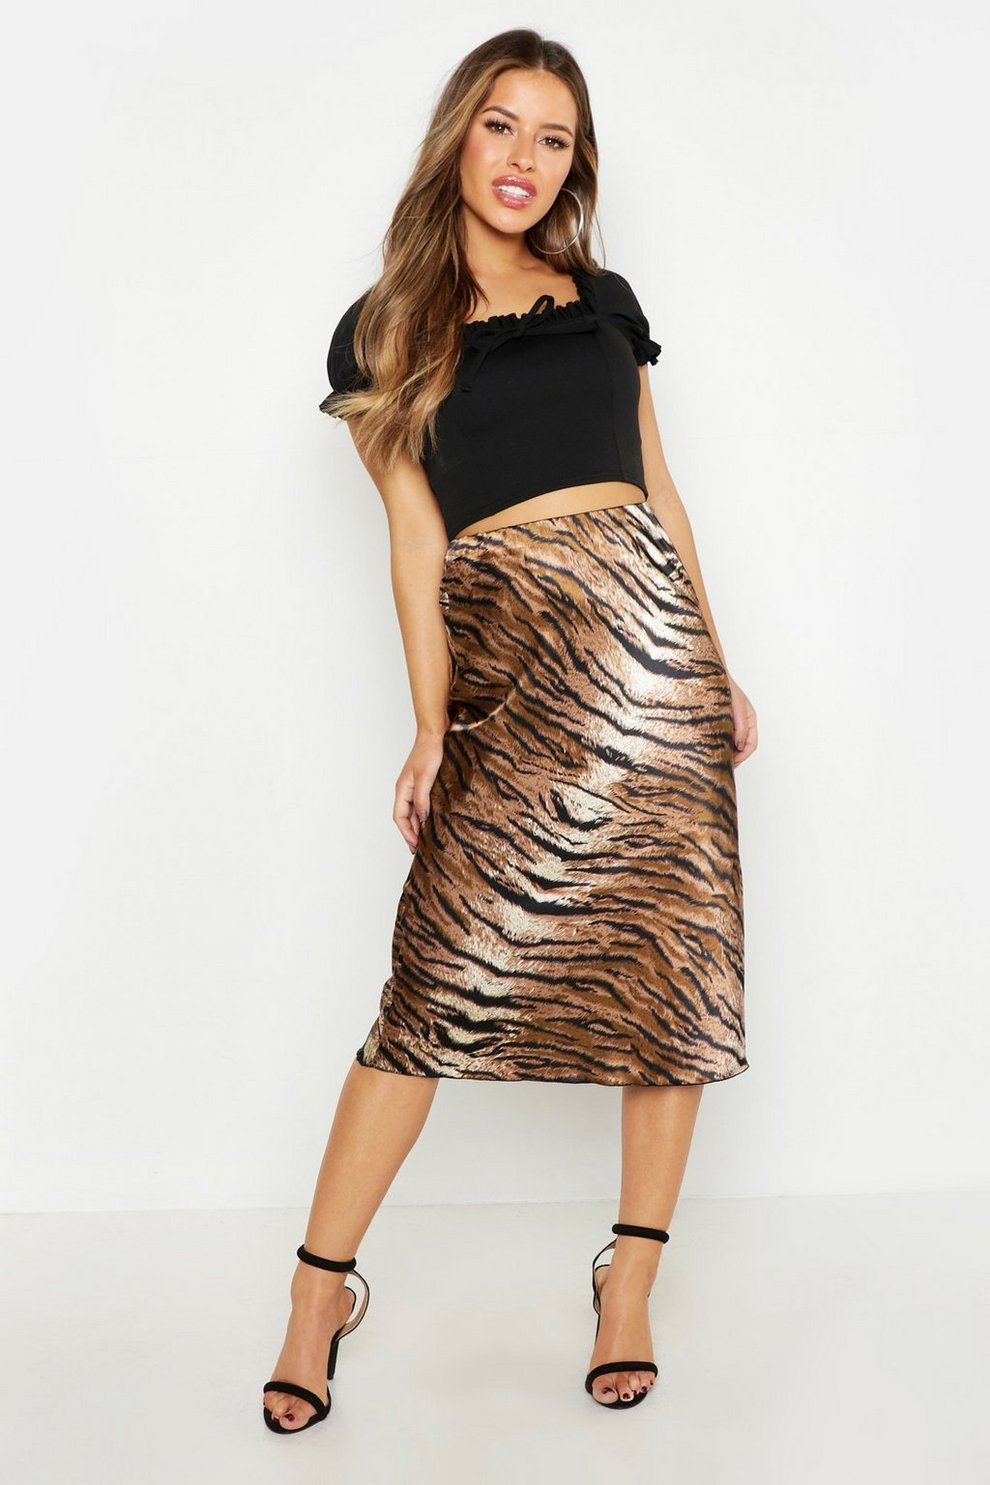 29a83a244690 Womens Tan Petite Satin Tiger Print Bias Cut Midi Skirt